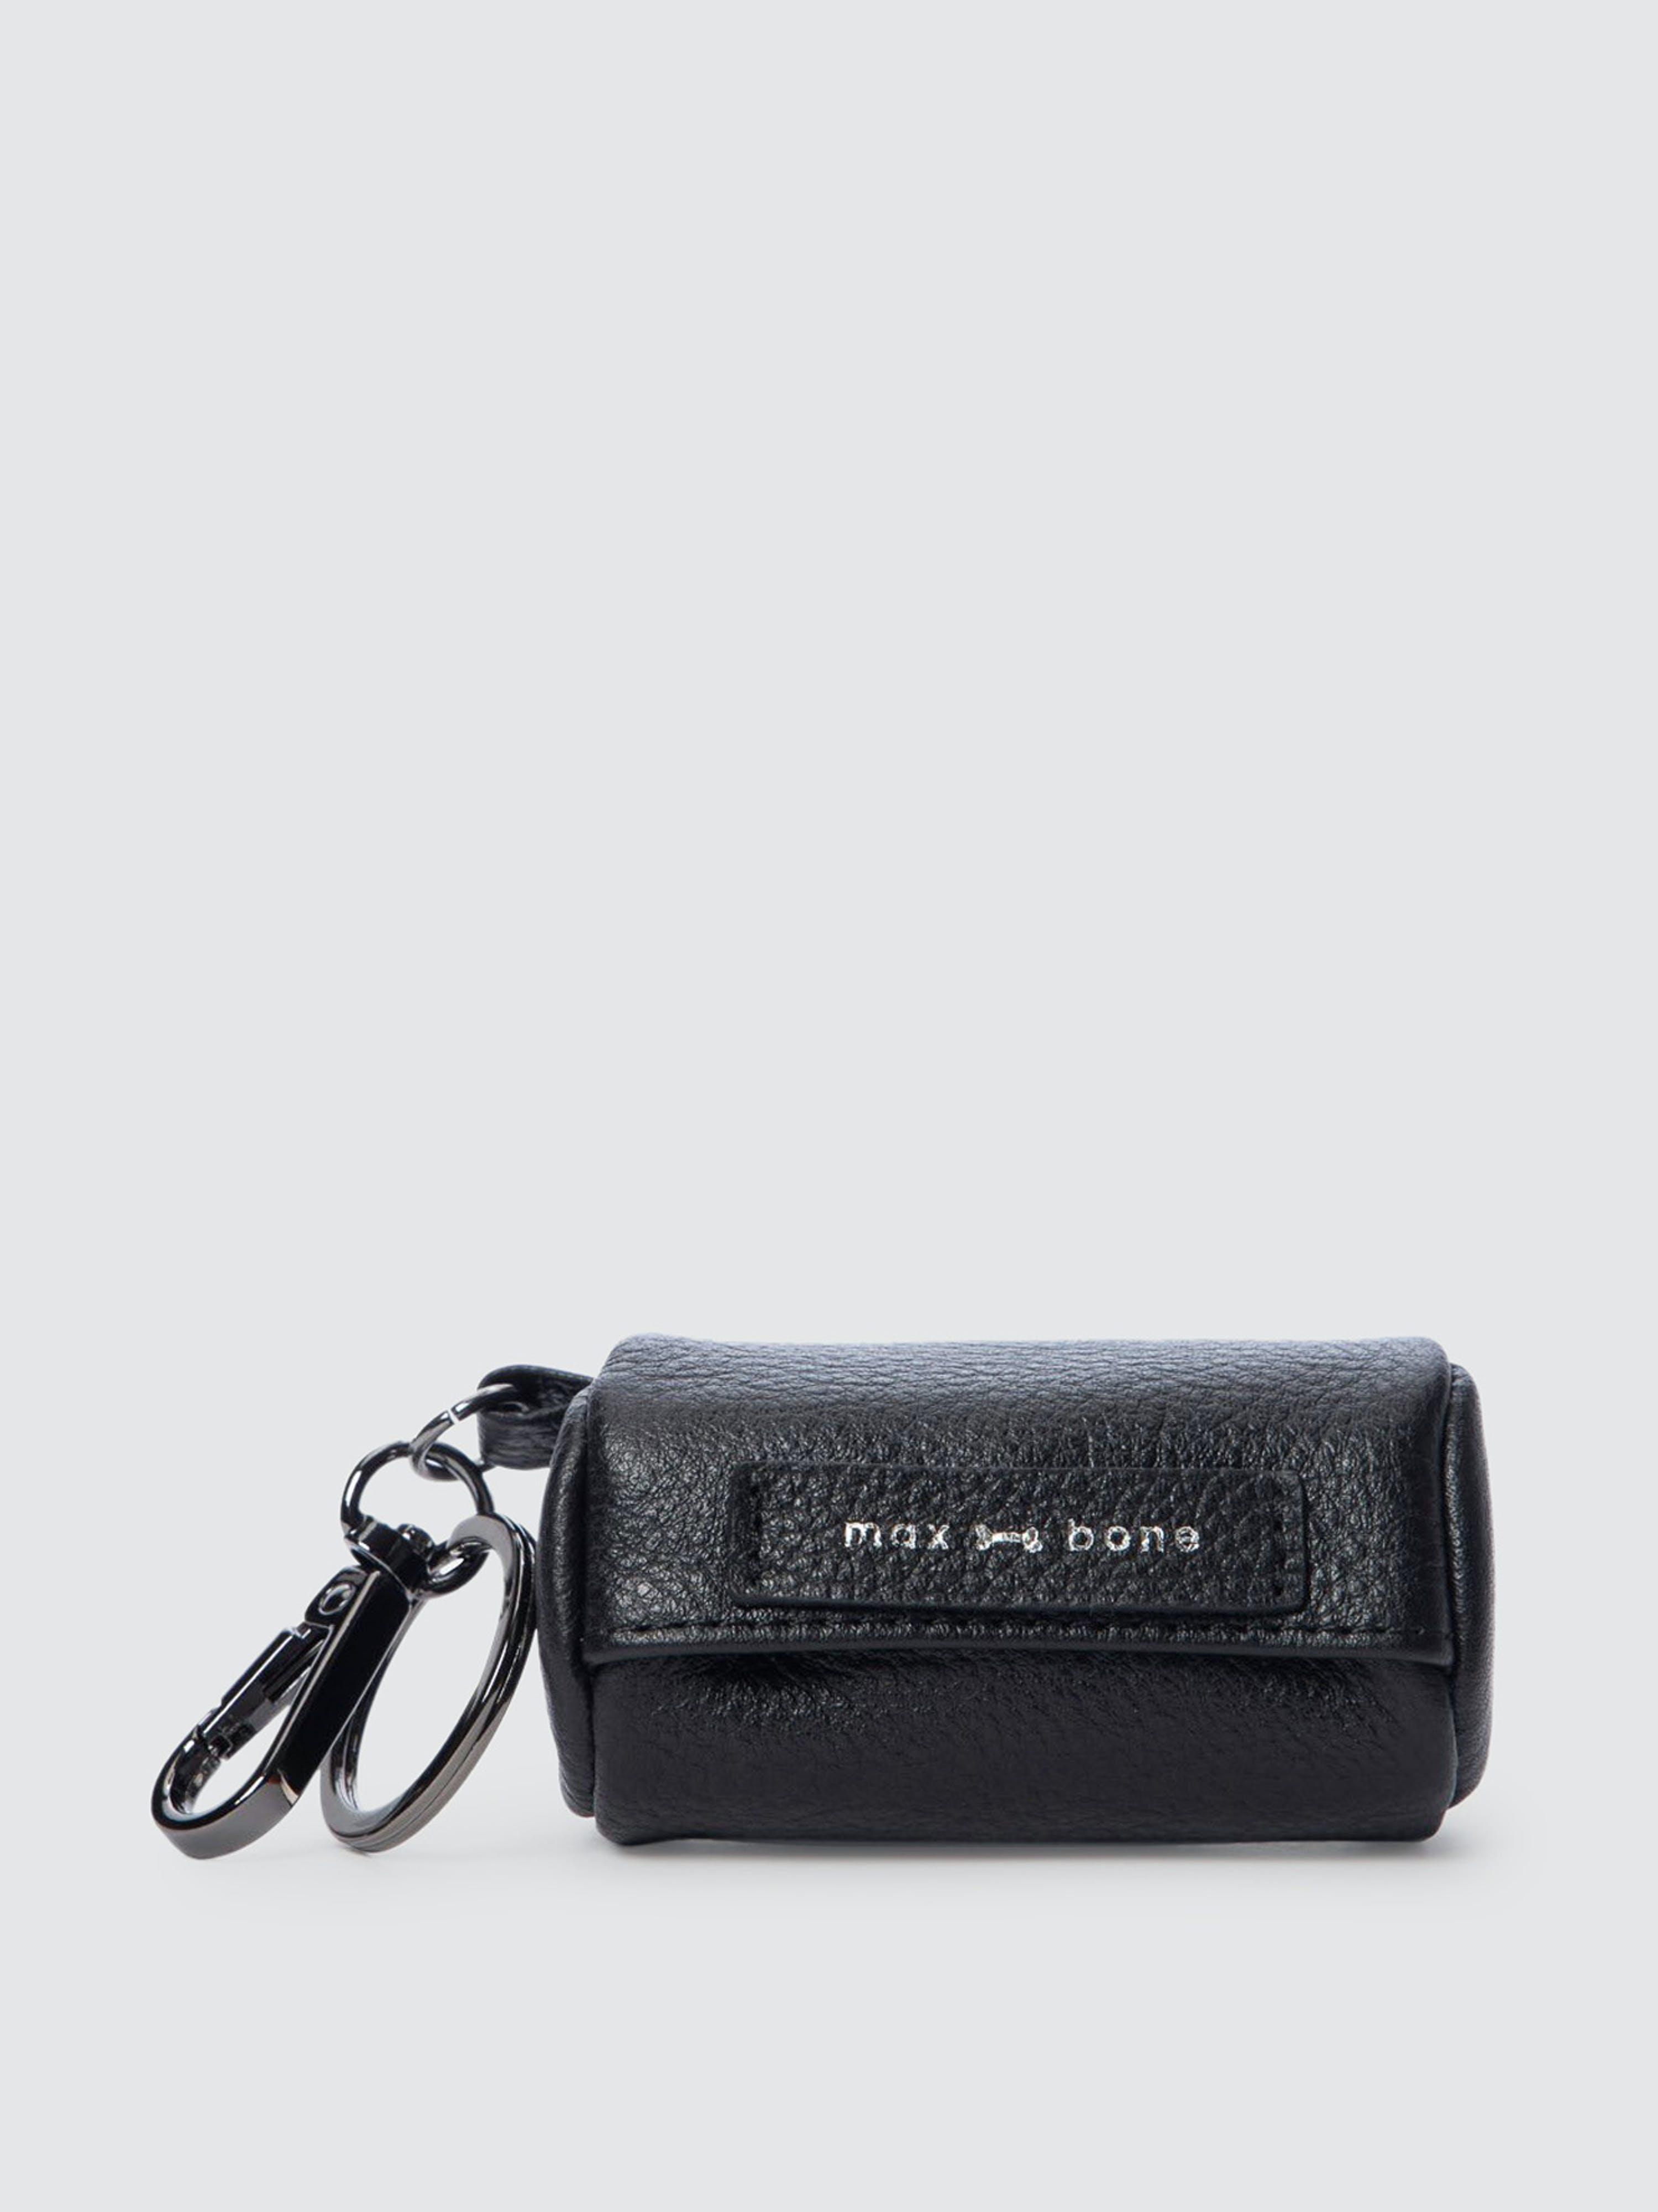 Max Bone Abigail Poop Bag Holder In Black